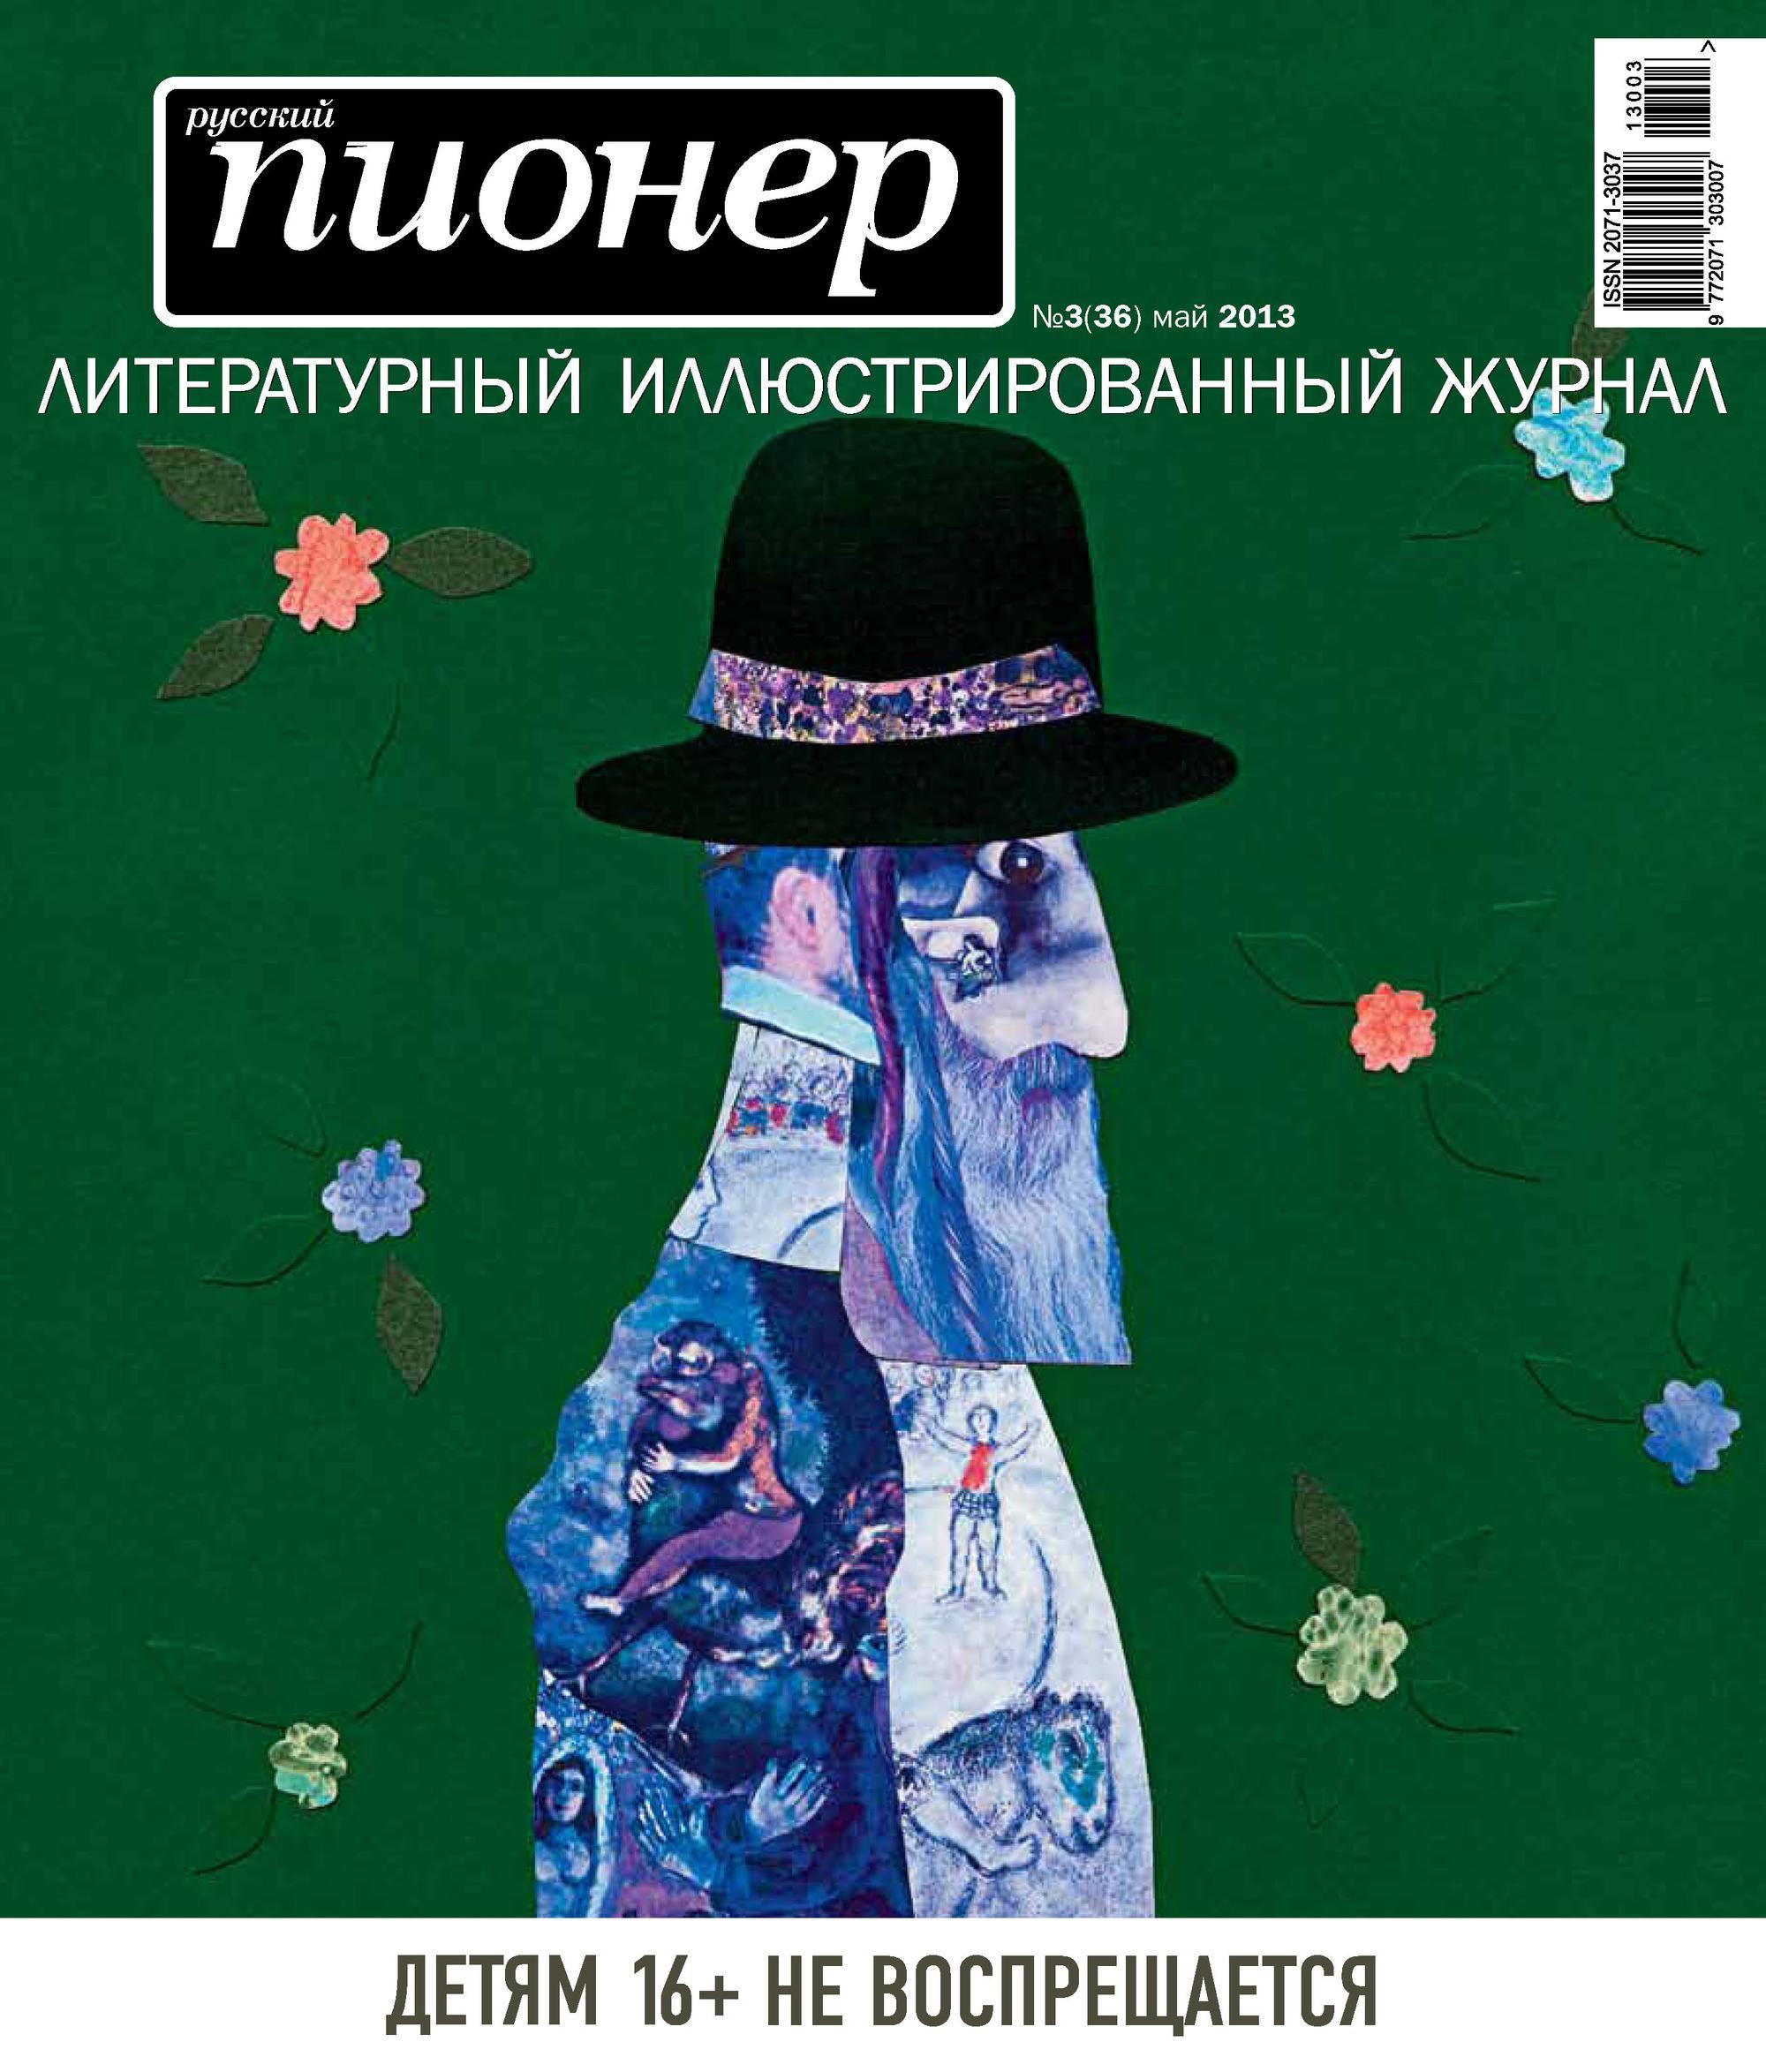 Русский пионер №3 (36), май 2013